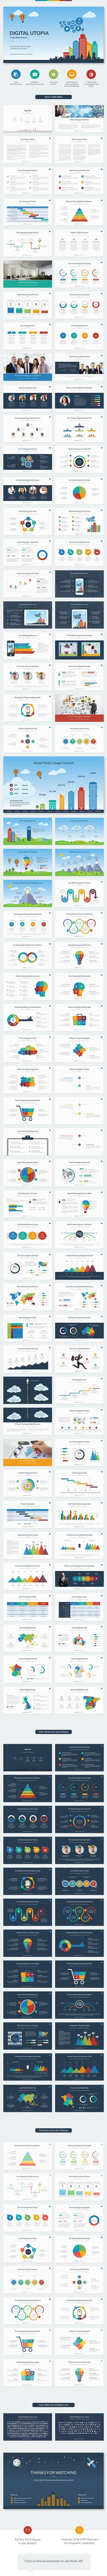 Digital Utopia Google Slides Template - Google Slides - Company Presentation - Projection - Inspirational Infographic Presentation - Maps - Slides - Slideshare - Clean - Creative PowerPoint